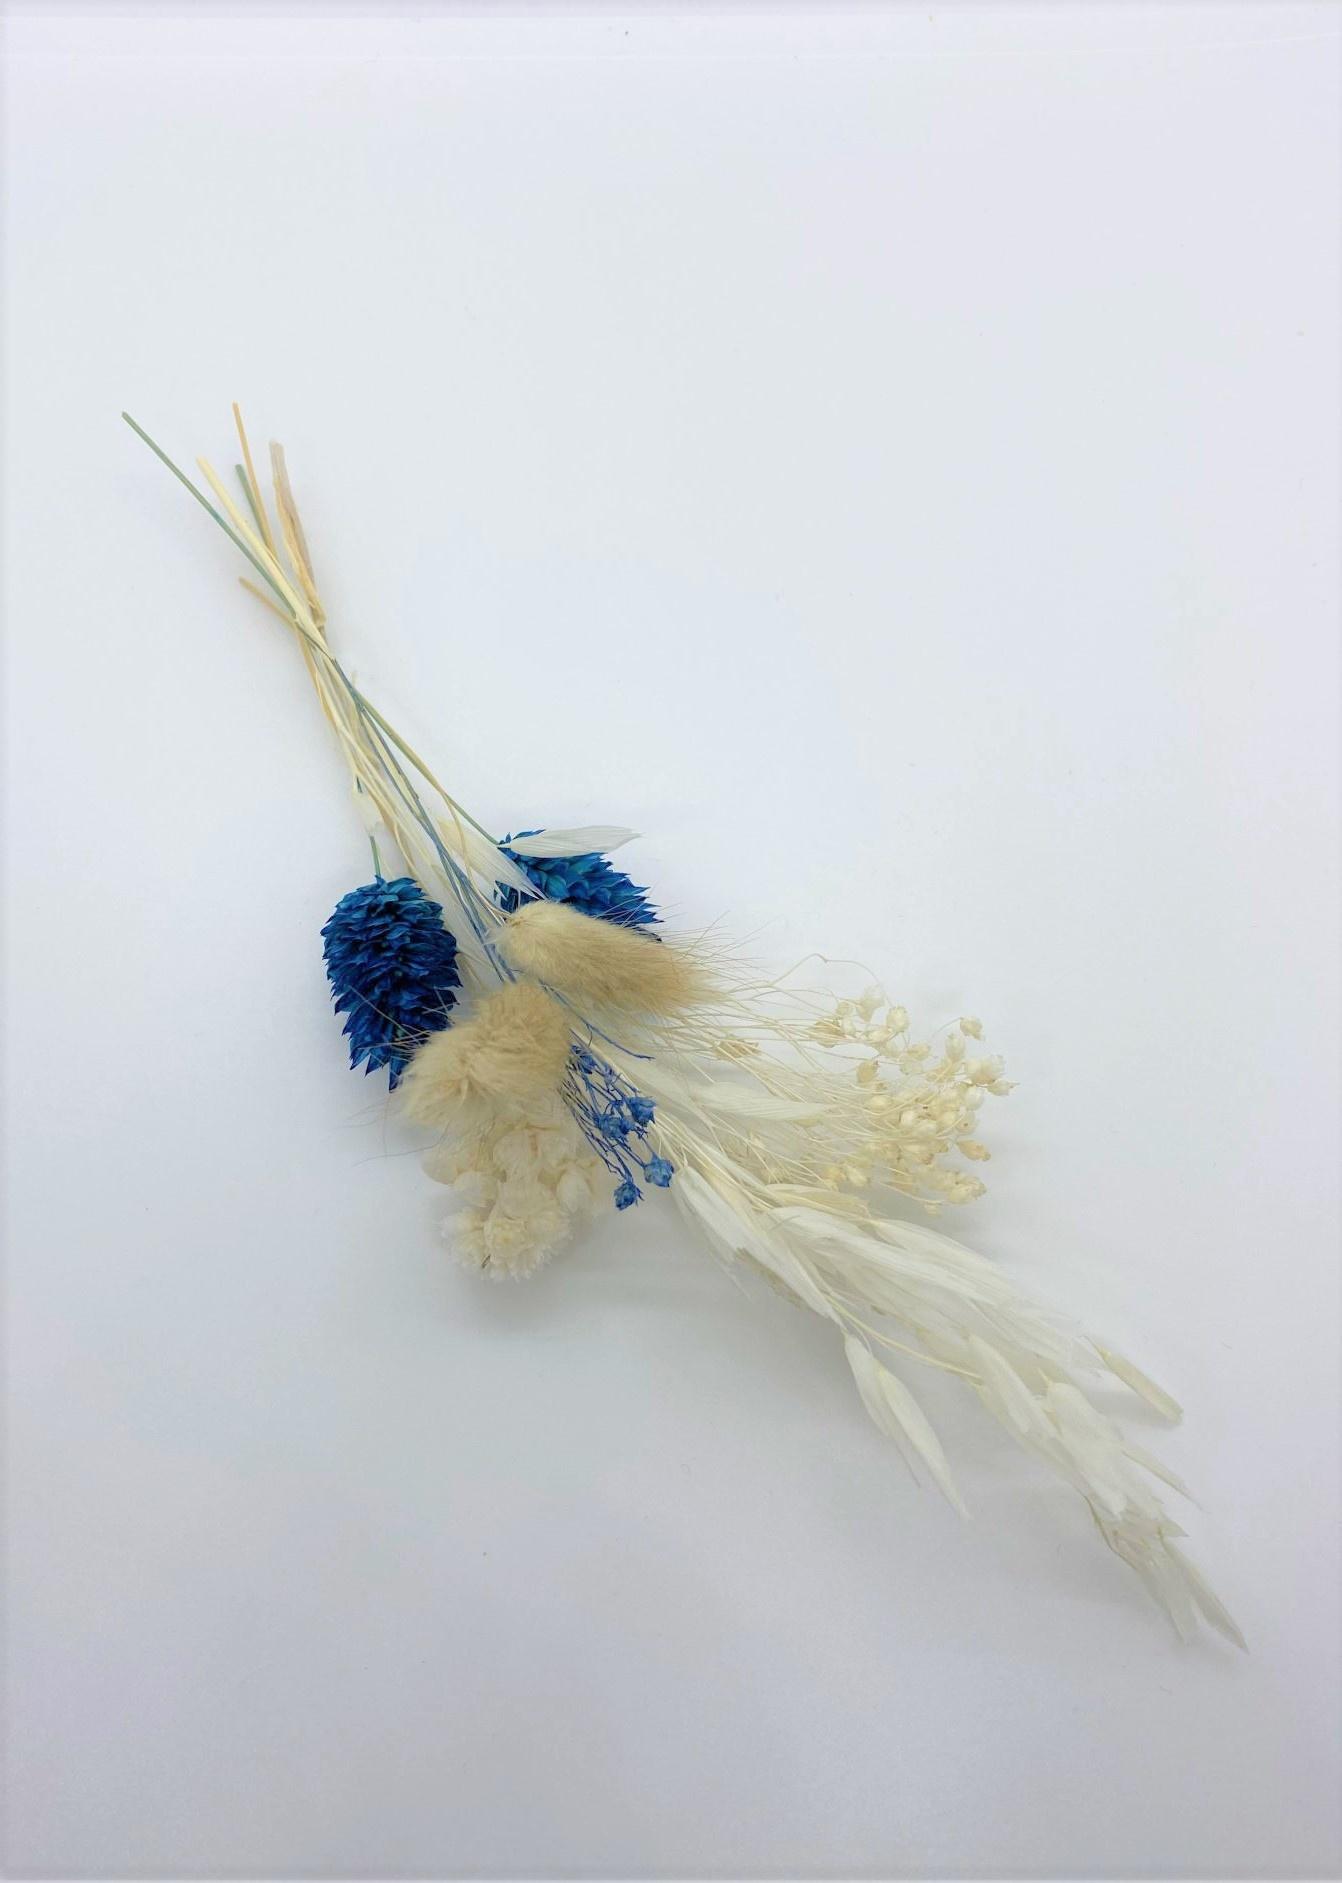 Mini Droogboeket Blauw - Atelier Olala-1